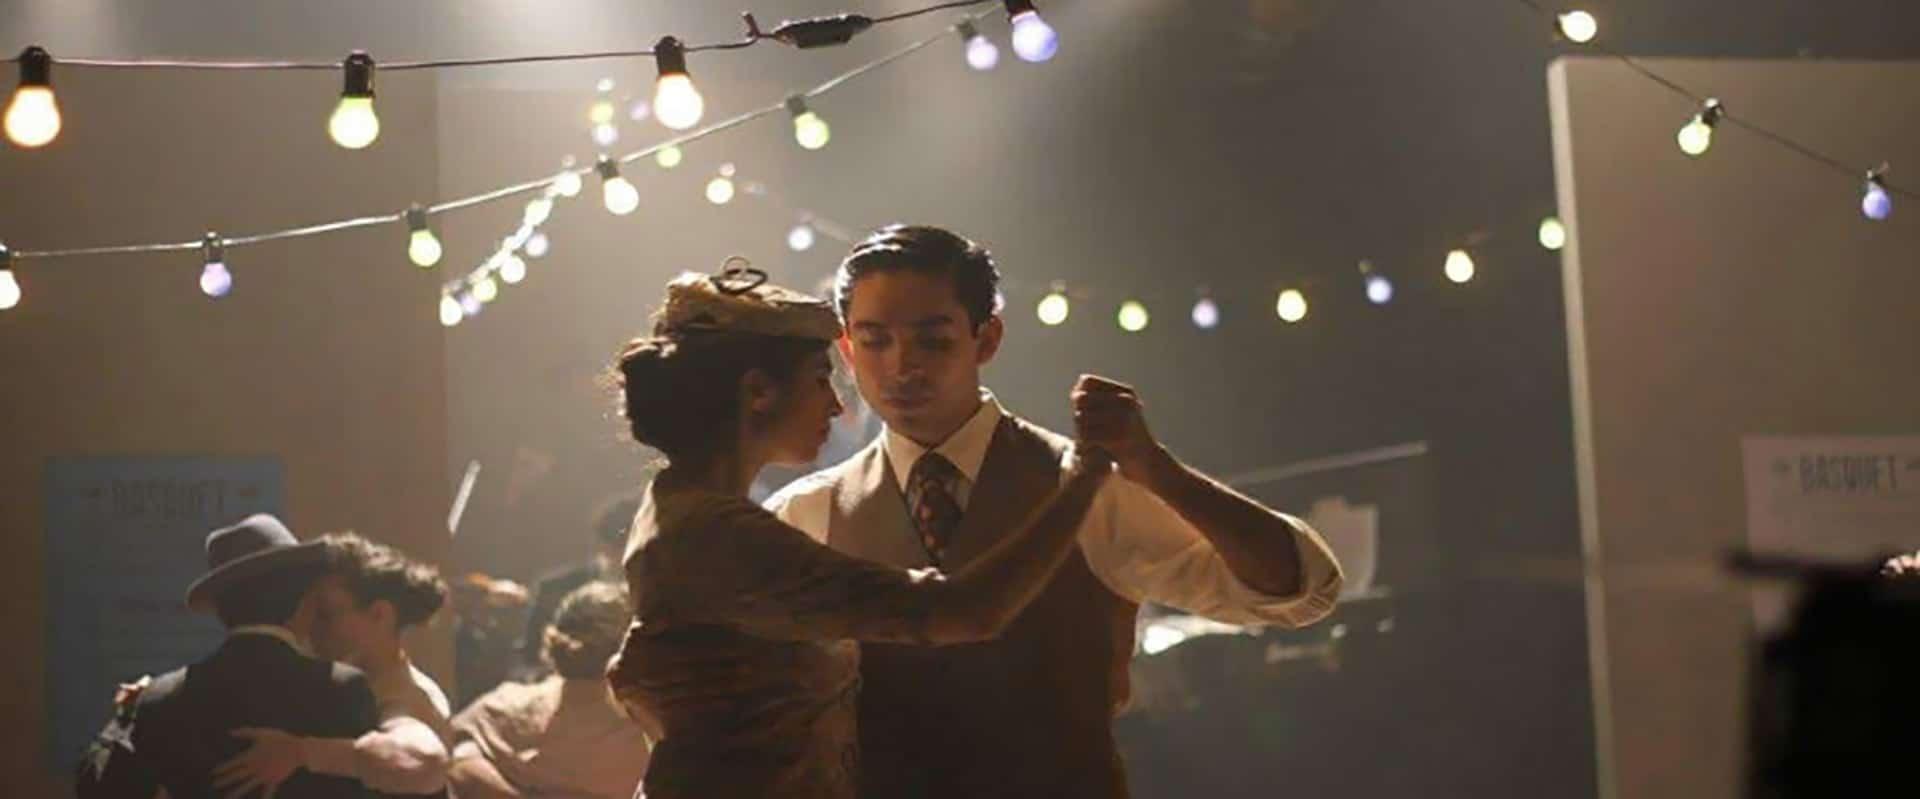 saint valentin amerique latine tango tierra latina tango danseurs